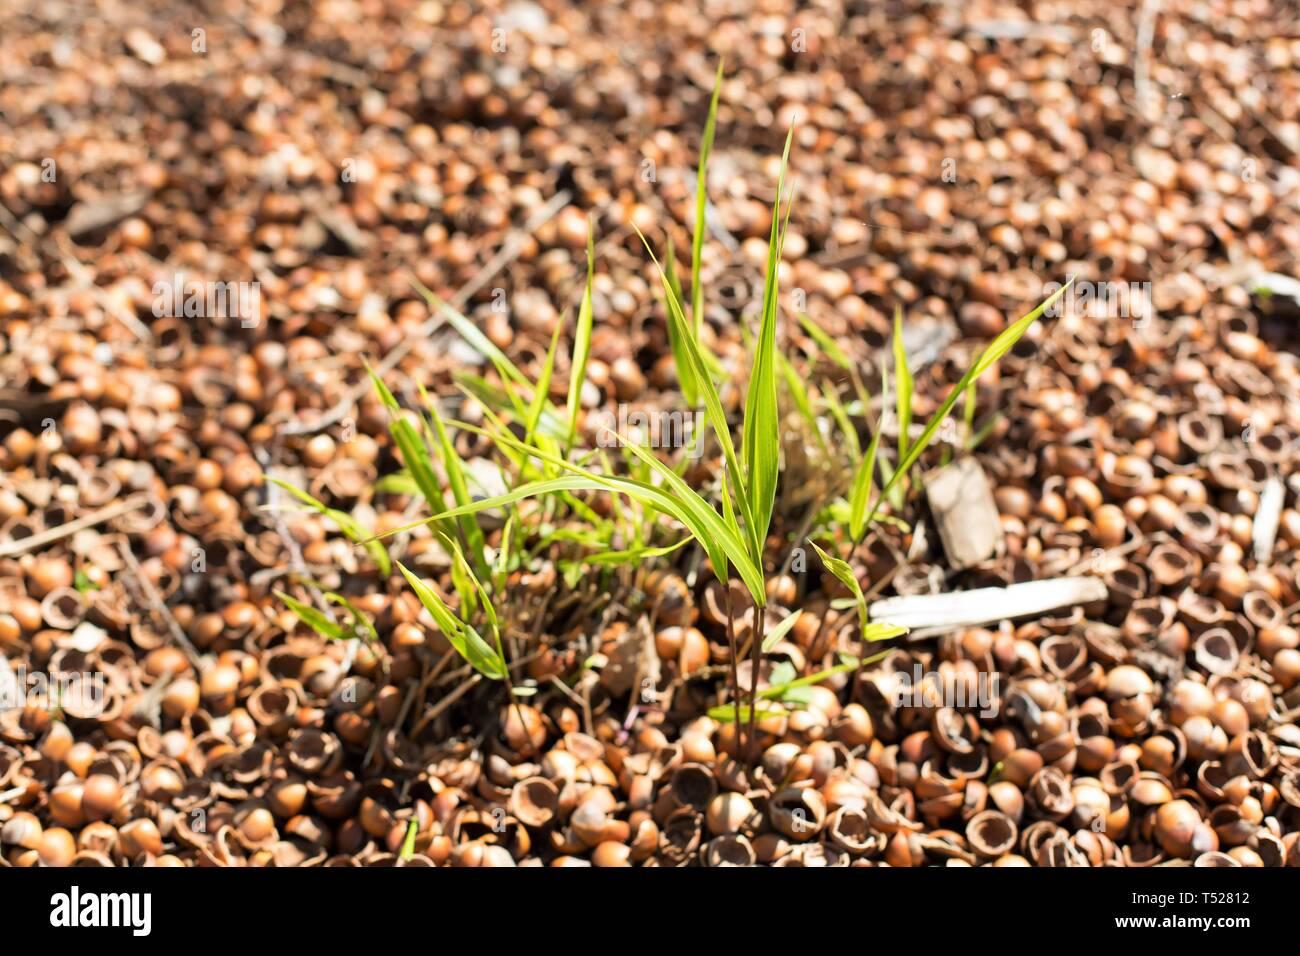 Hakonechloa Macra Japanischen Wald Gras Mit Haselnuss Shell